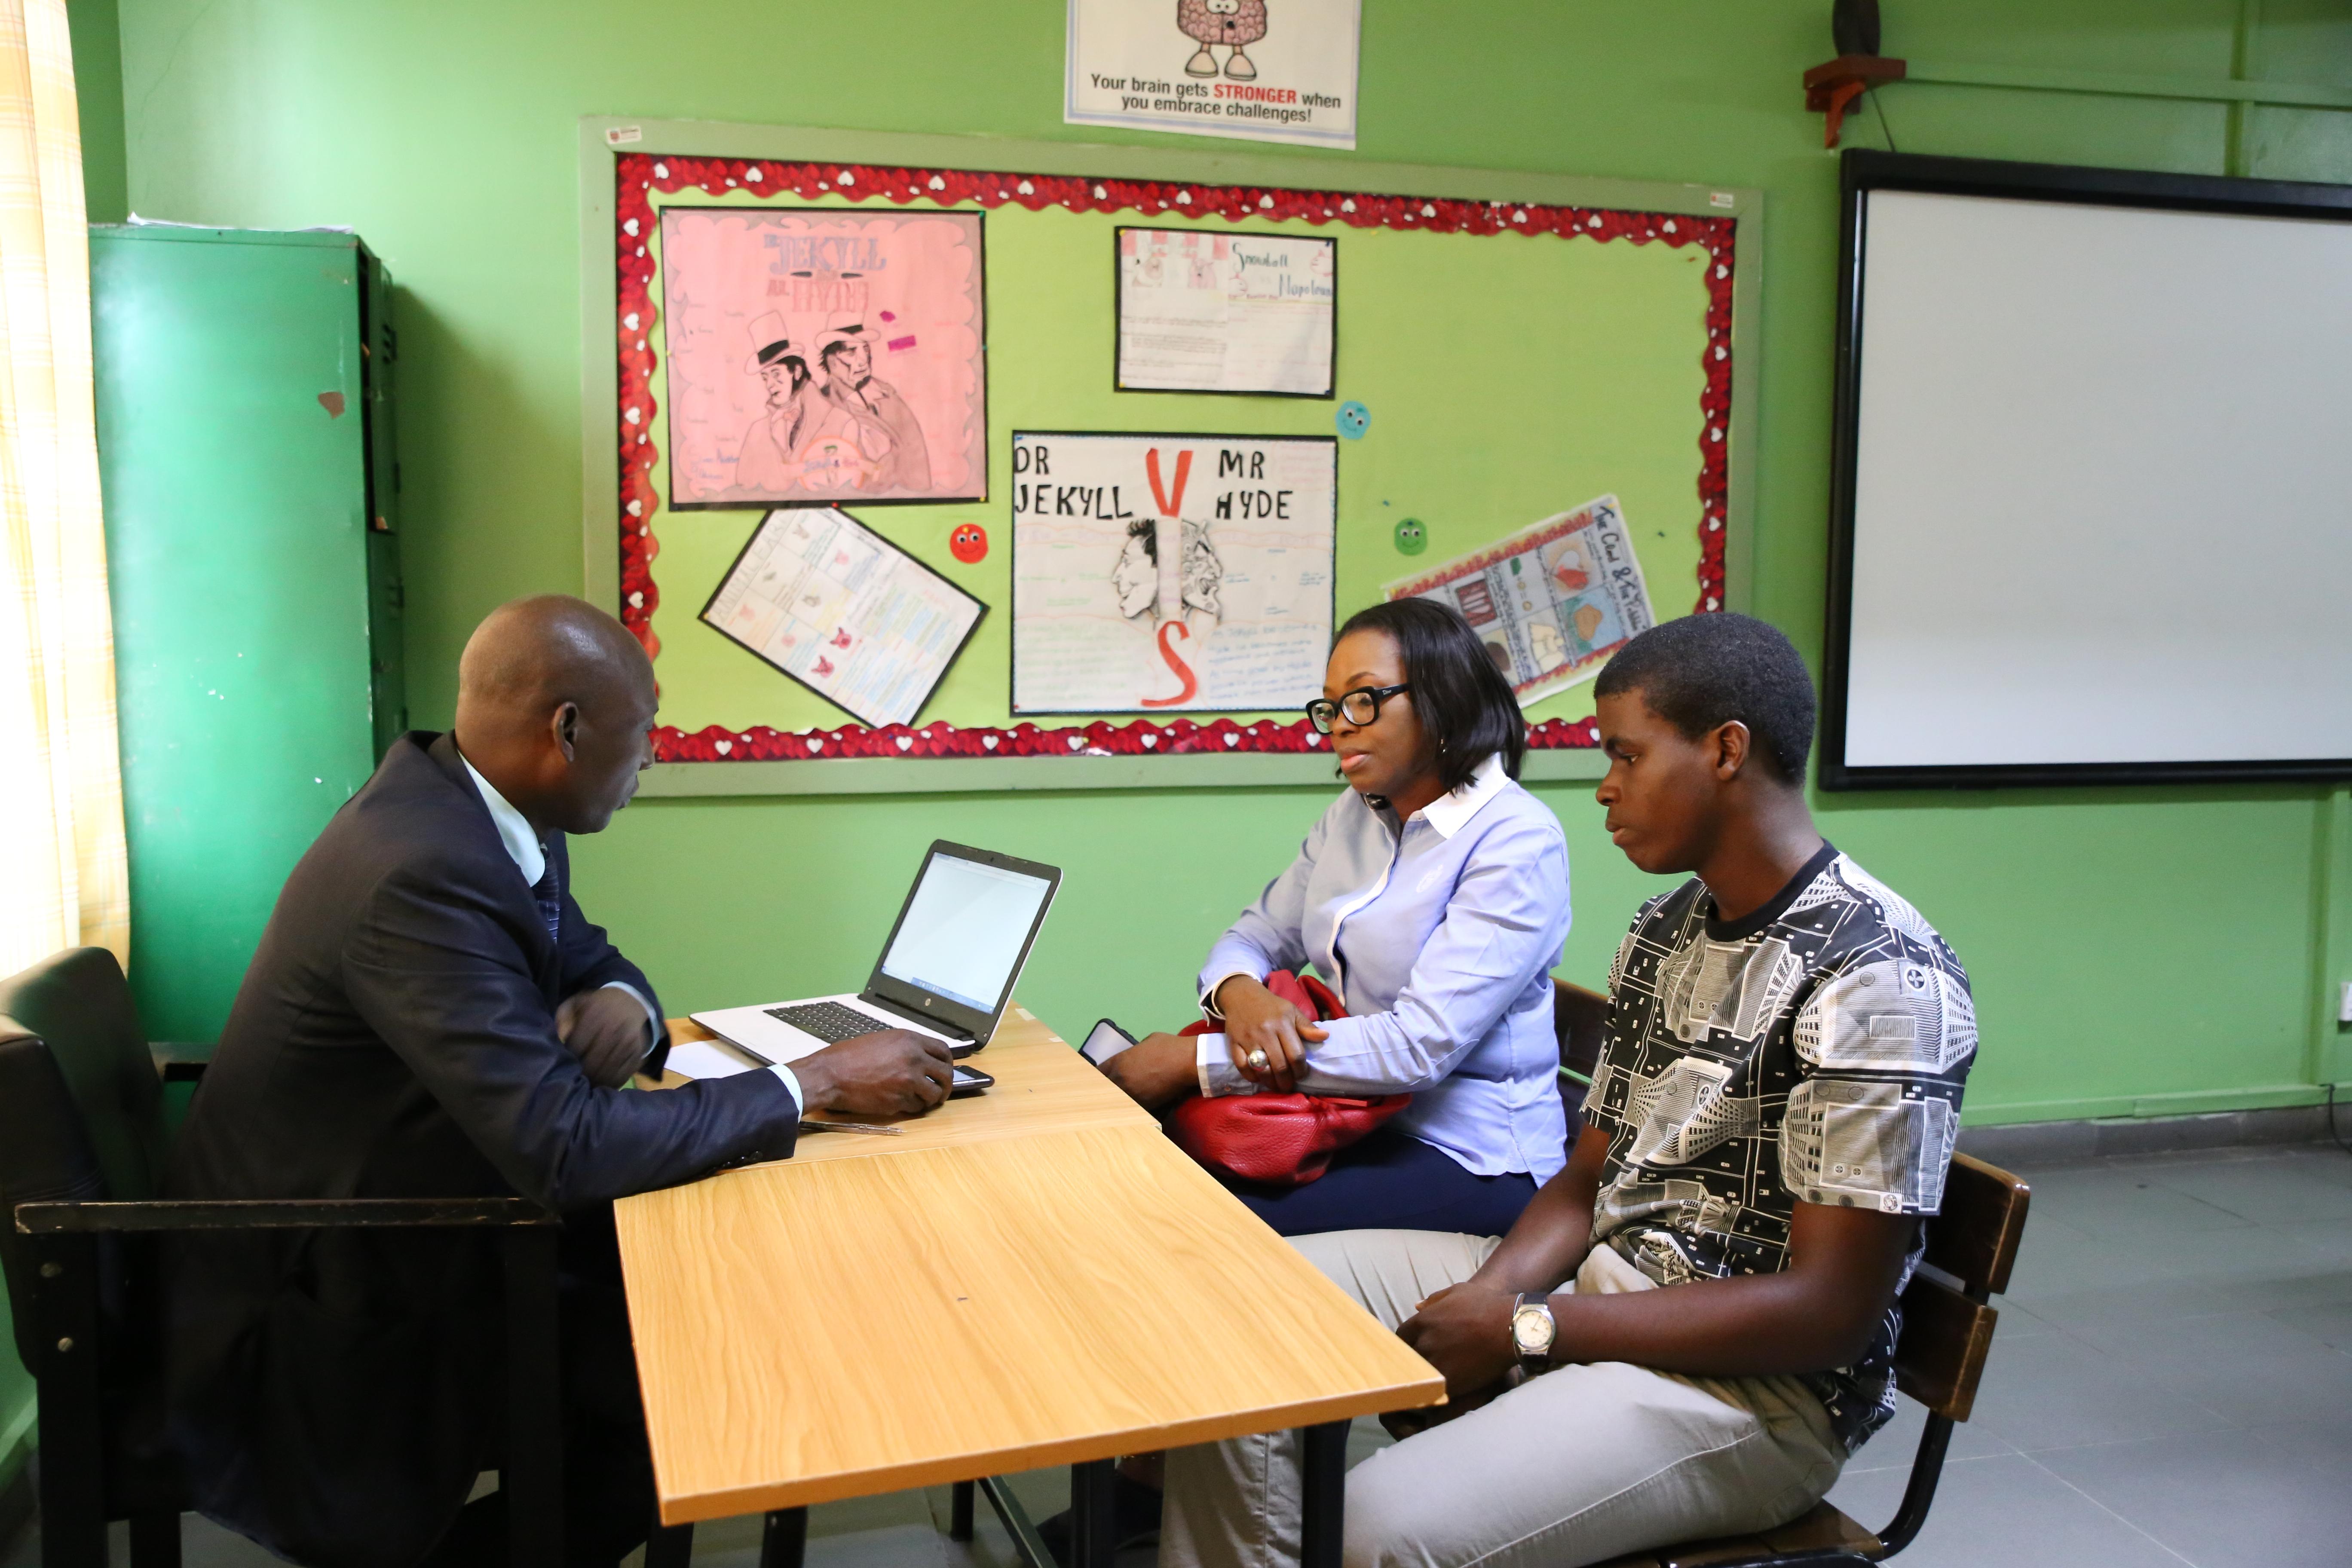 Academic support Greensprings School